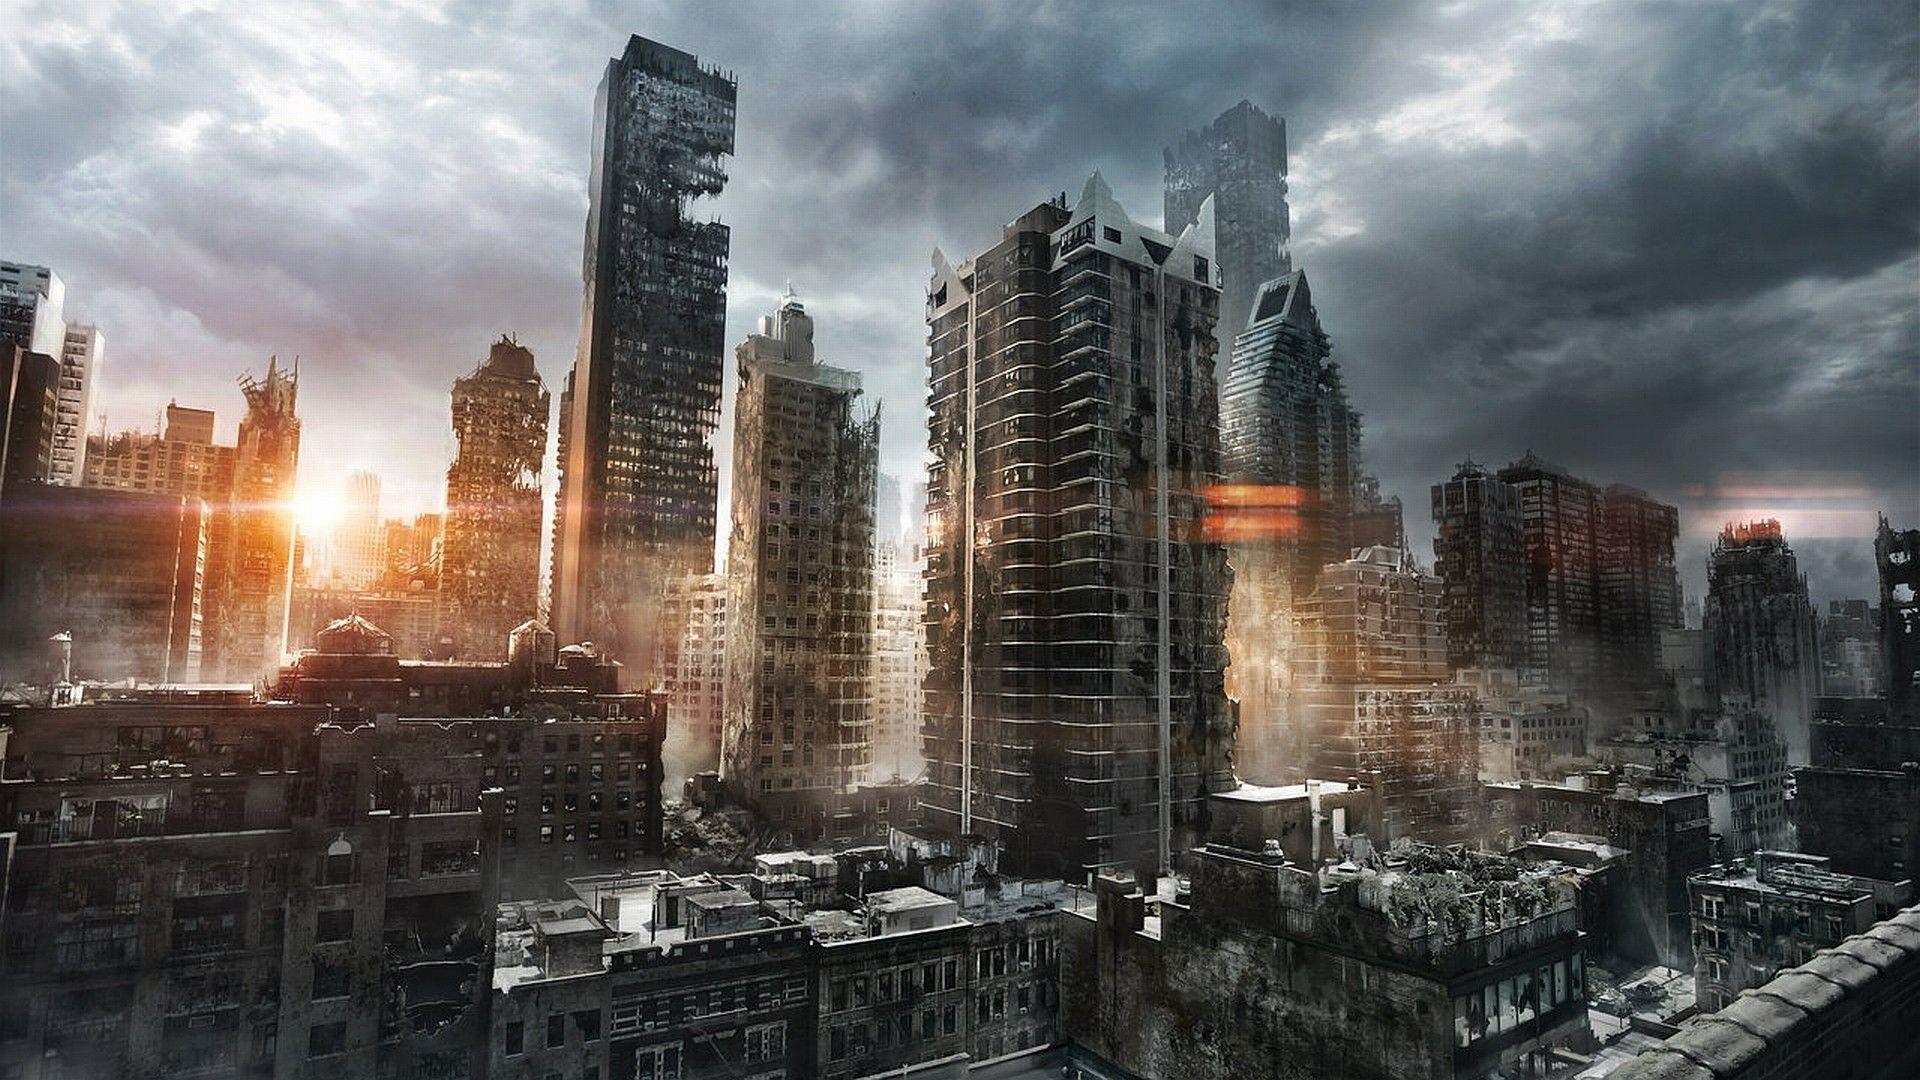 Image – Post-apocalyptic-city-fantasy-hd-wallpaper-1920×1080-1475.jpg |  HomeFront Fan fiction Wiki | FANDOM powered by Wikia